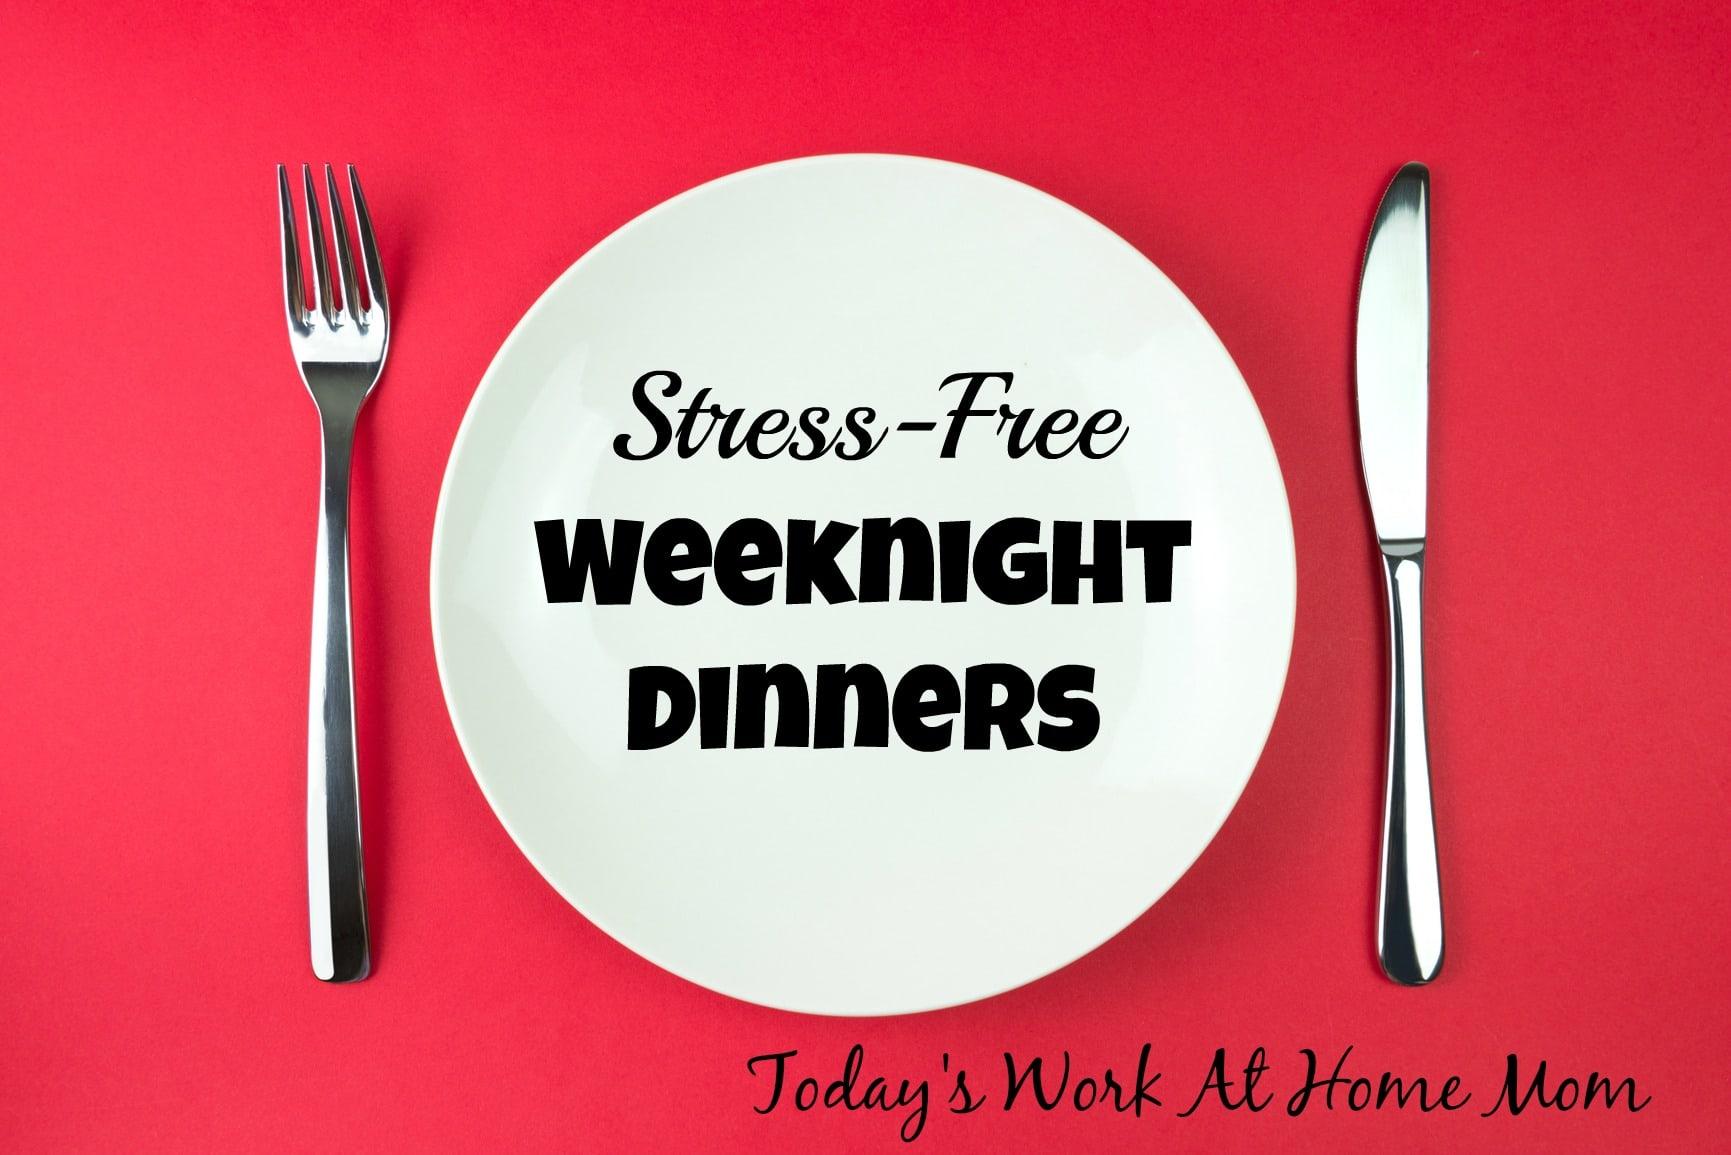 stress-free weeknight dinners